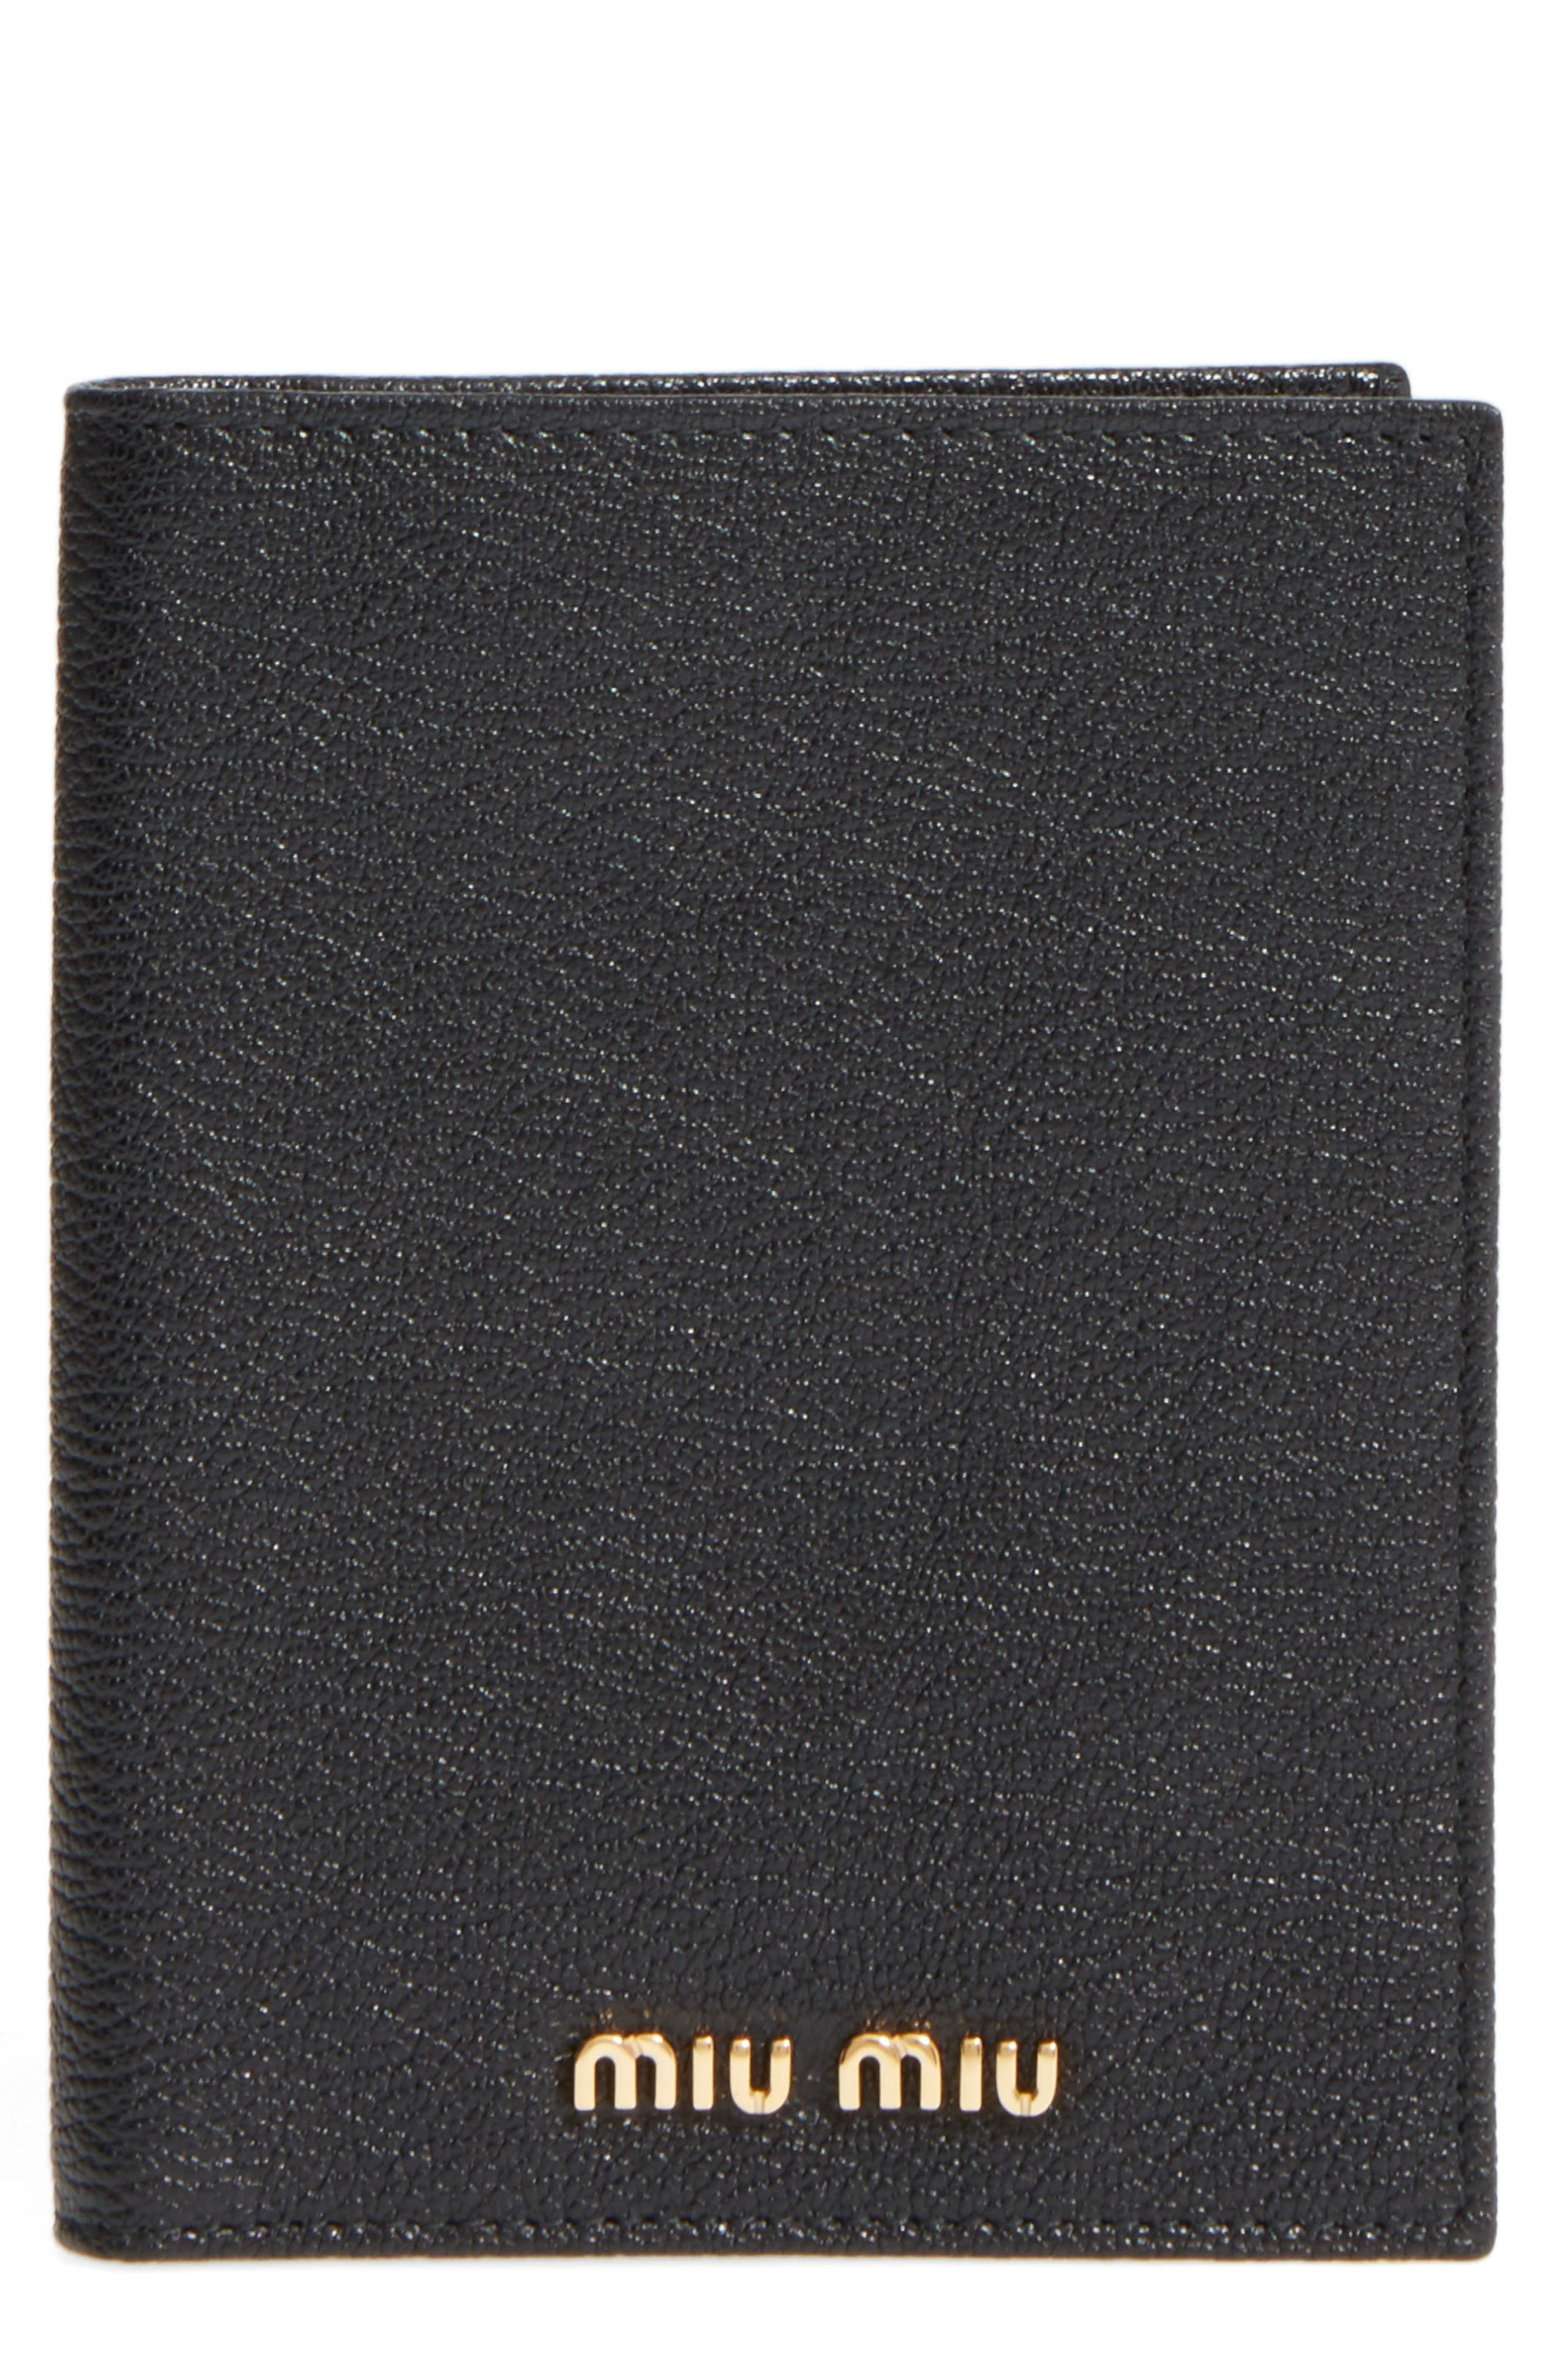 Alternate Image 1 Selected - Miu Miu Leather Passport Case